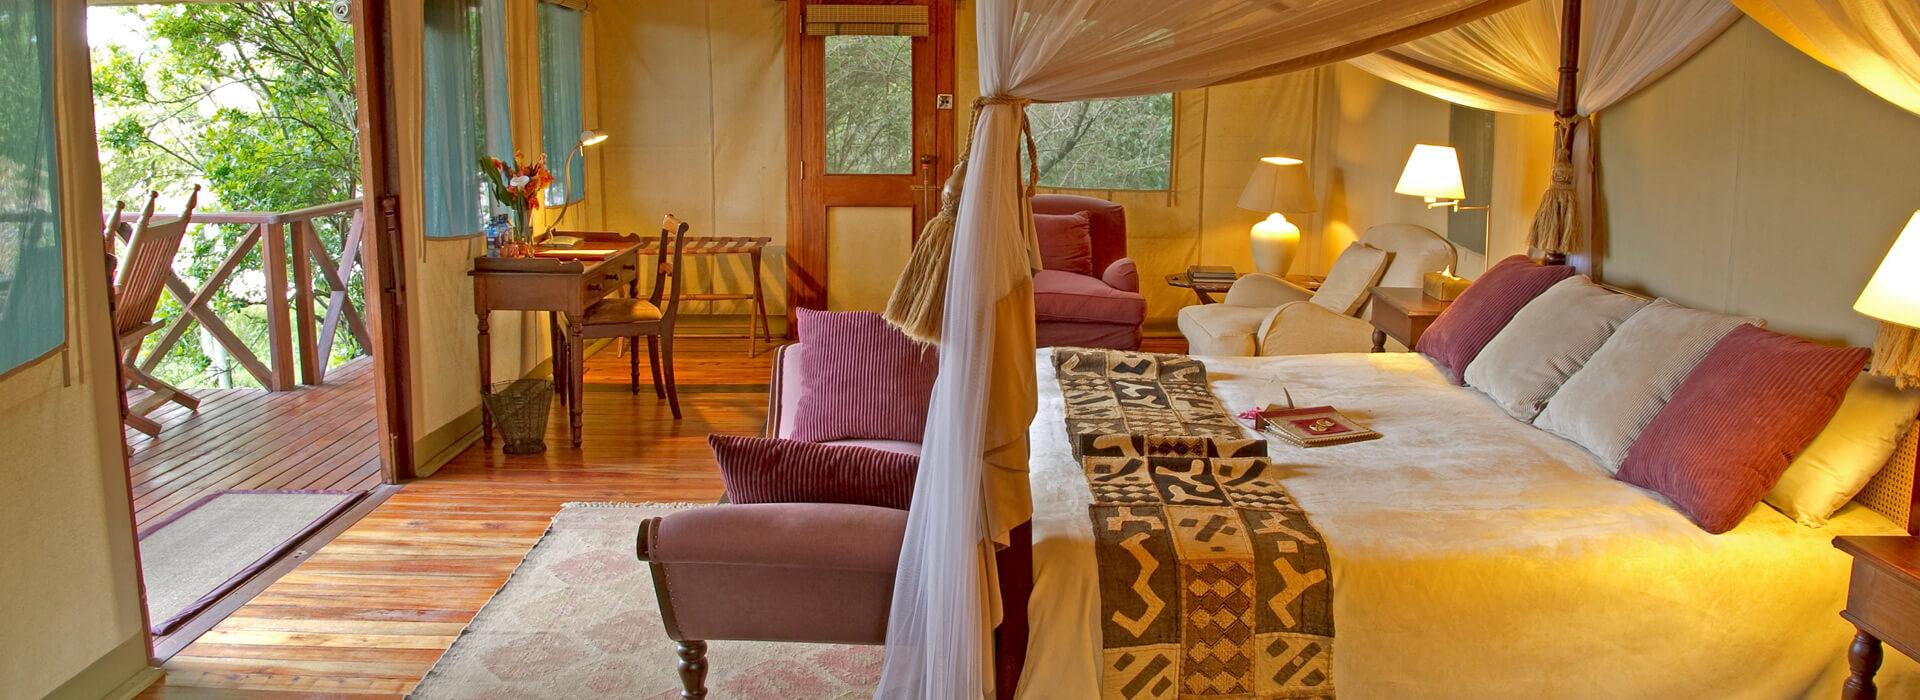 8 Days Kenya Luxury Safari Banner